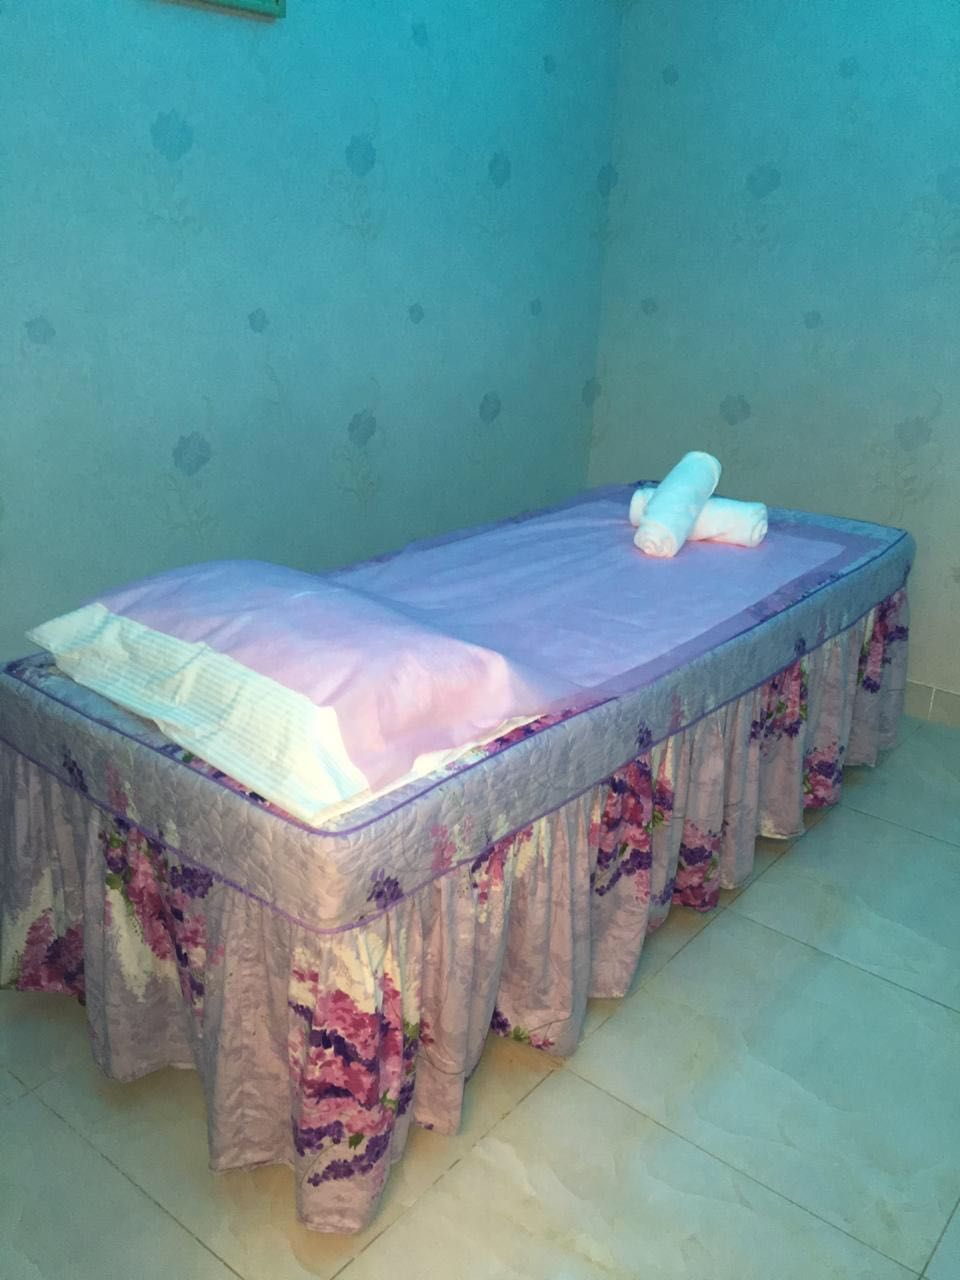 Nancy Massage Spa Center In Deira Dubai 971 55 502 3803 With